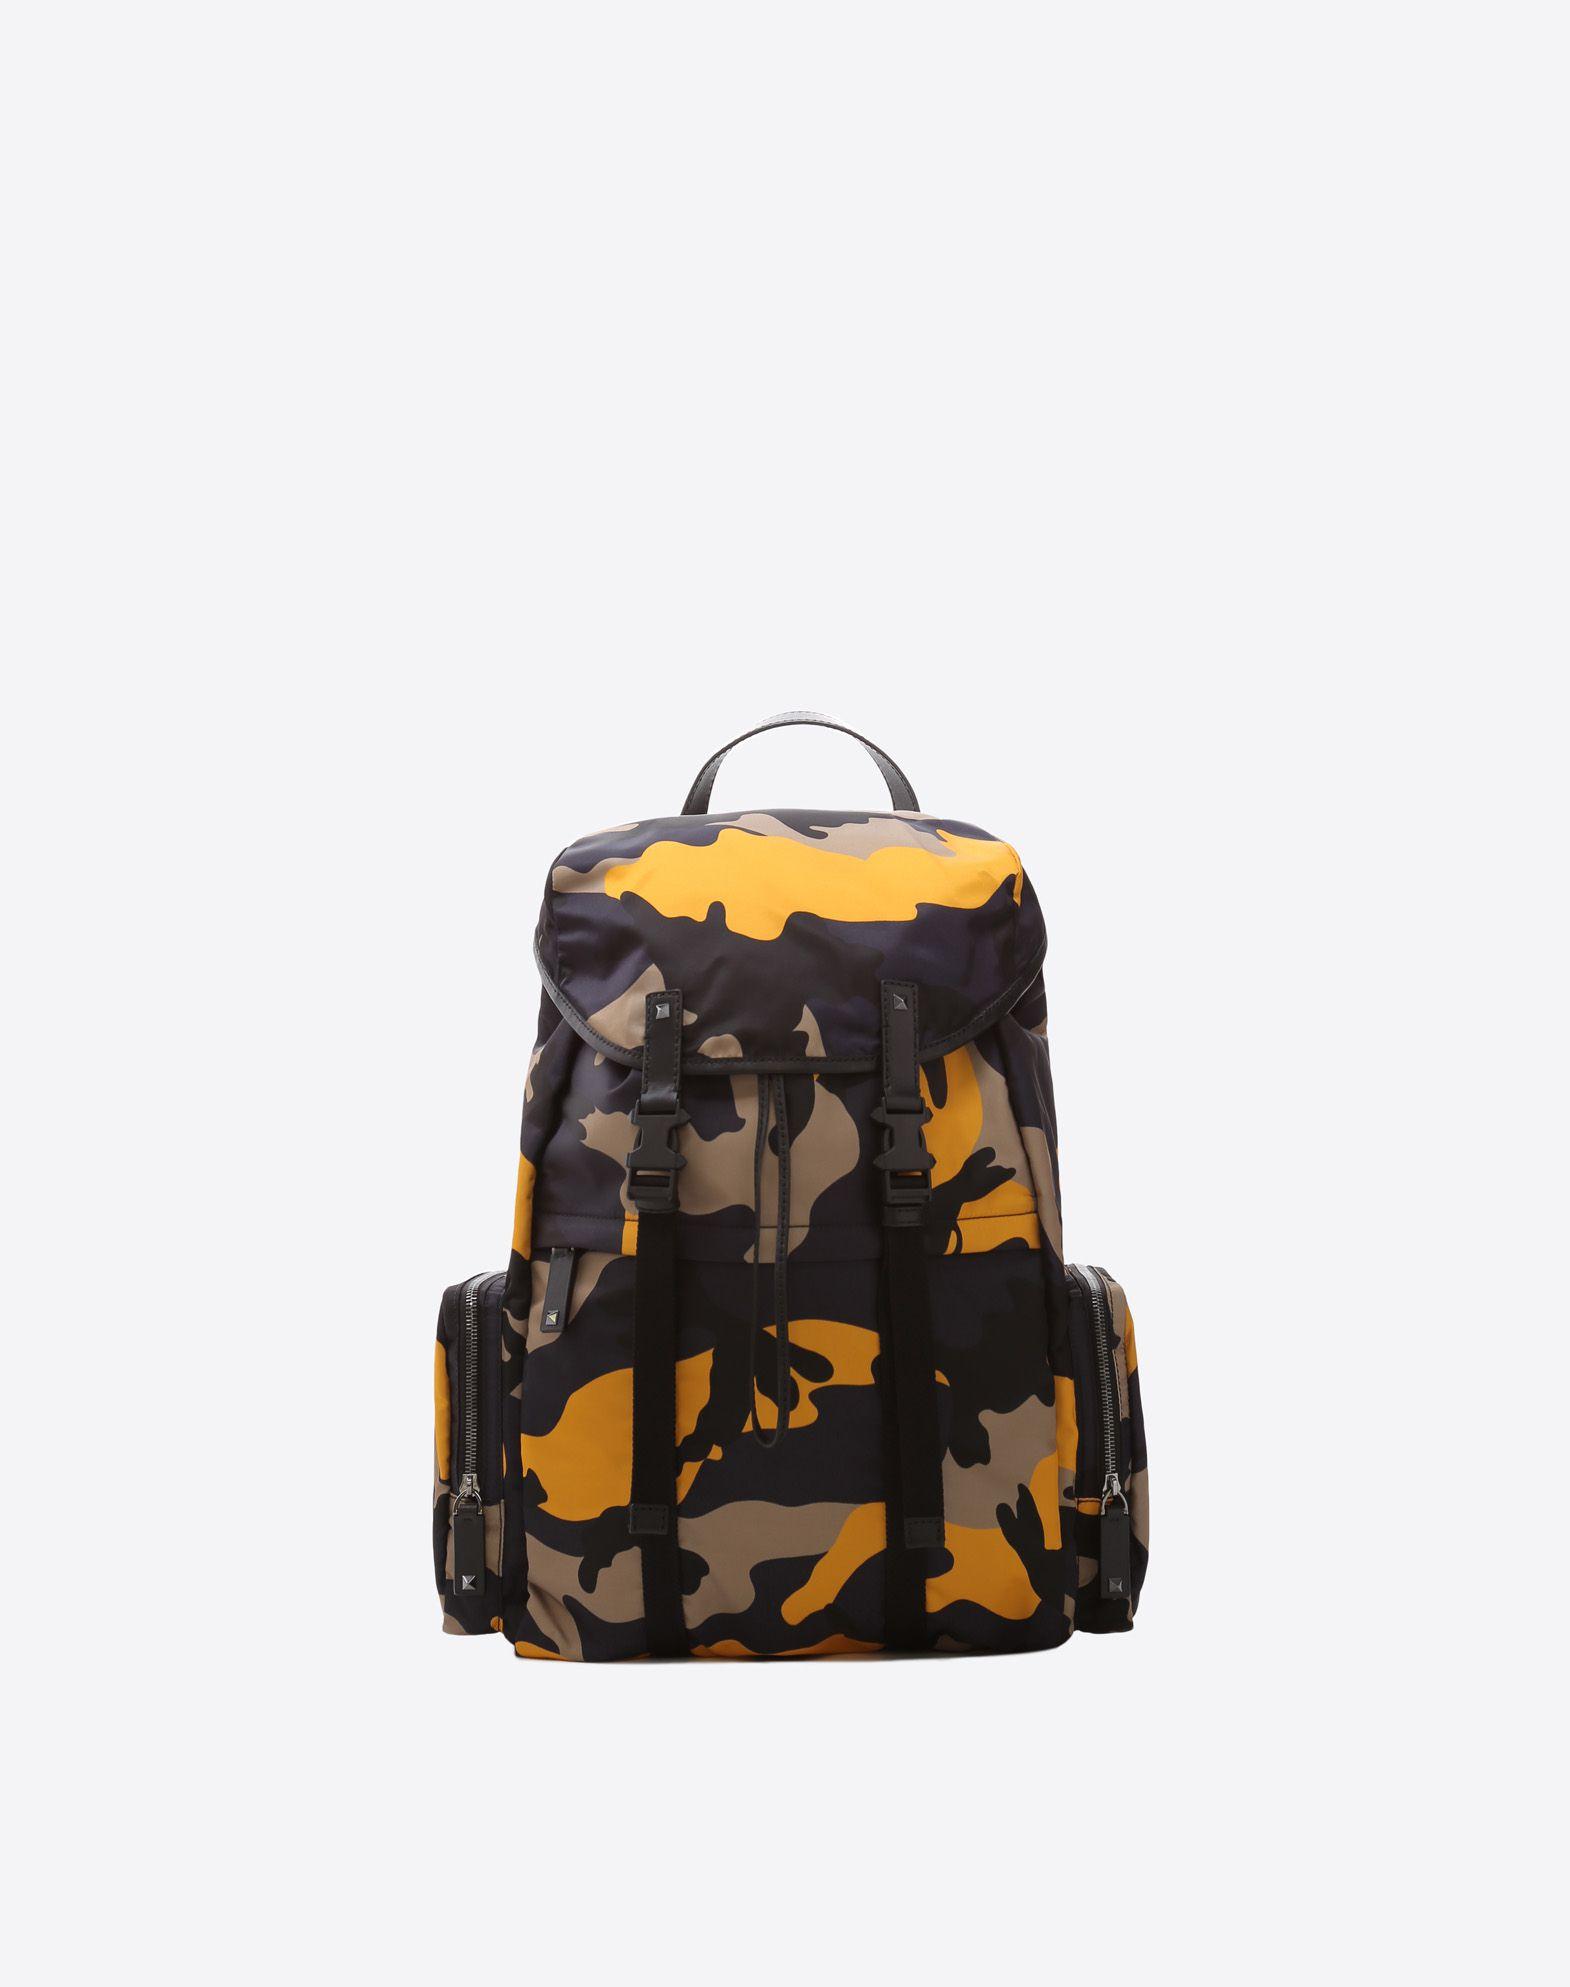 VALENTINO Techno fabric Logo Camouflage Dual buckle closure External pockets Internal pockets Rucksacks & Bumbags  45387866bo